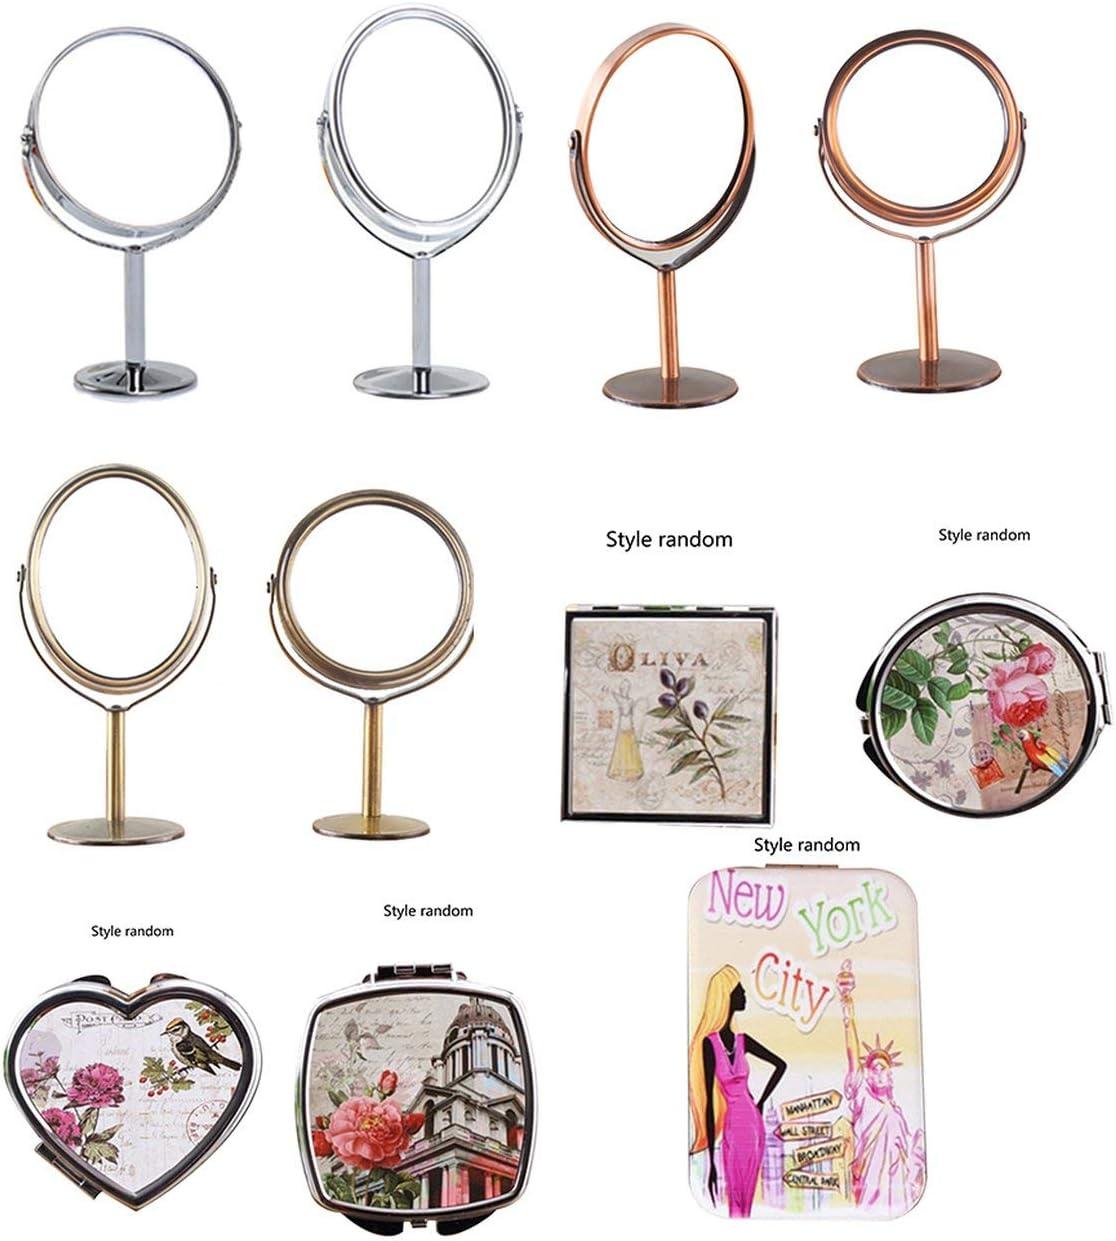 2 fonction de grossissement miroir de maquillage Ba30FRllylelly 828t cor/éen miroir de maquillage en m/étal miroir miroir de miroir de bureau miroir rotatif 1